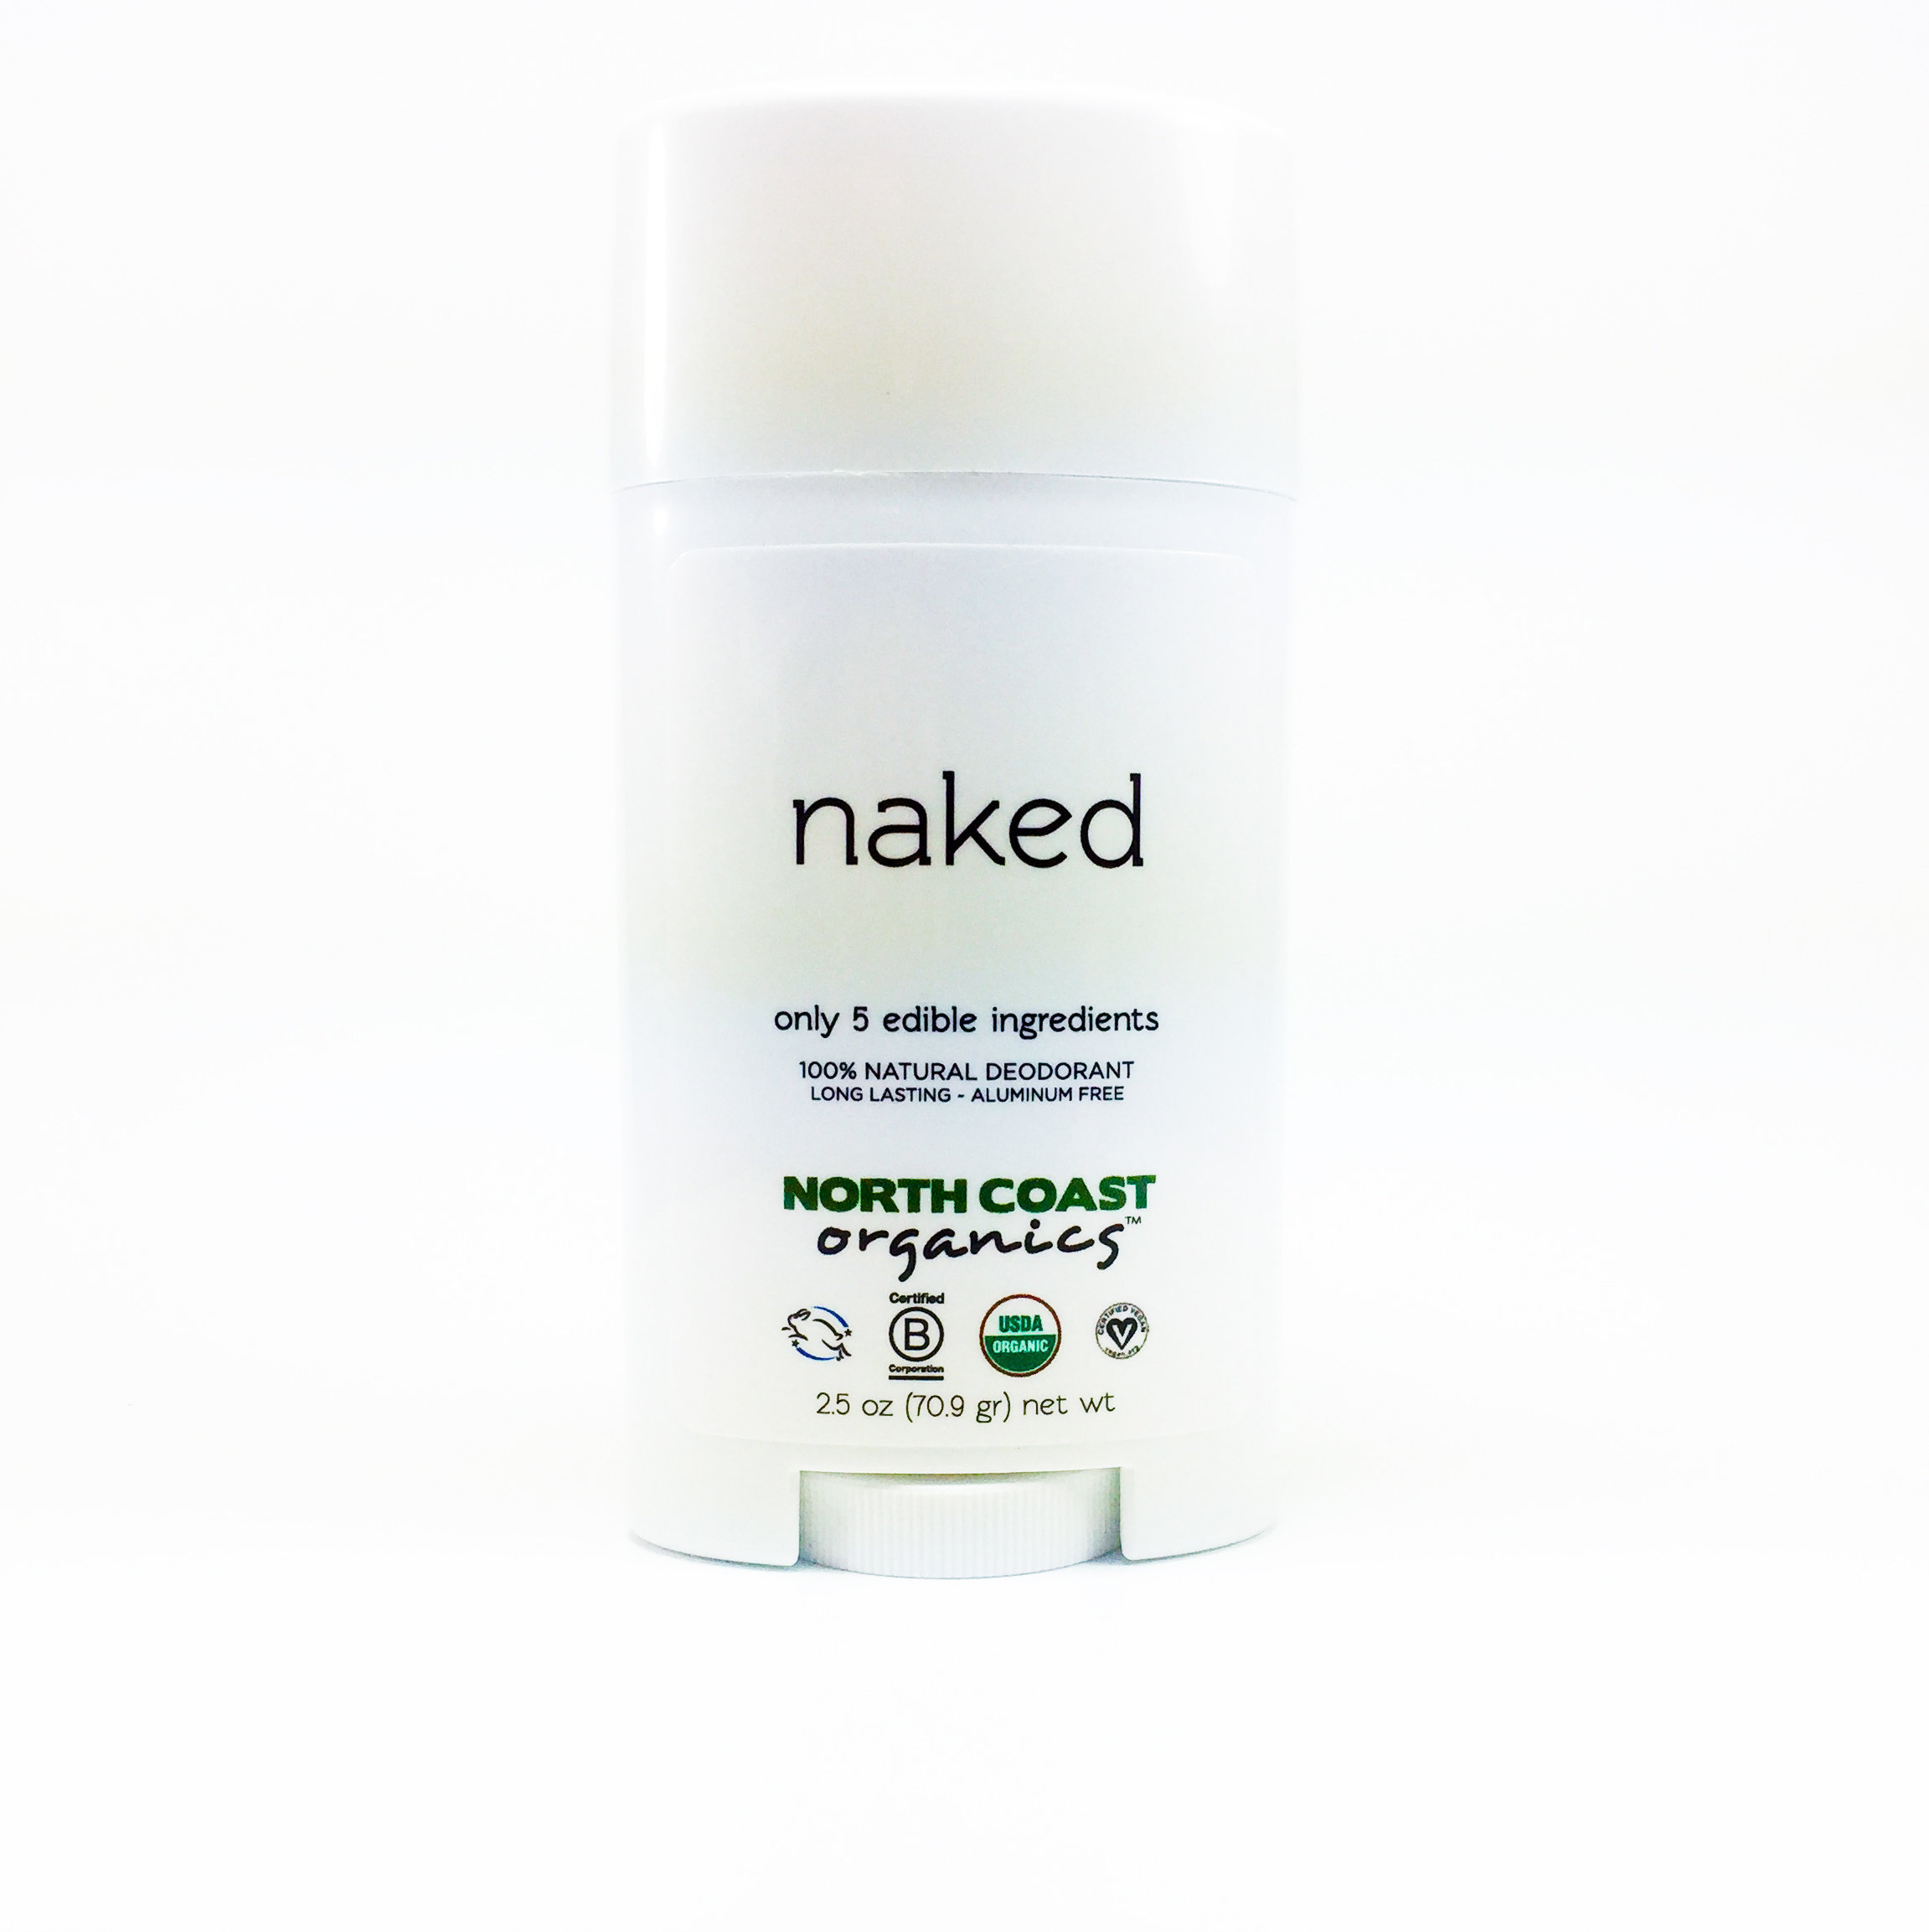 naked - Organic Deodorant 2.5oz 1003